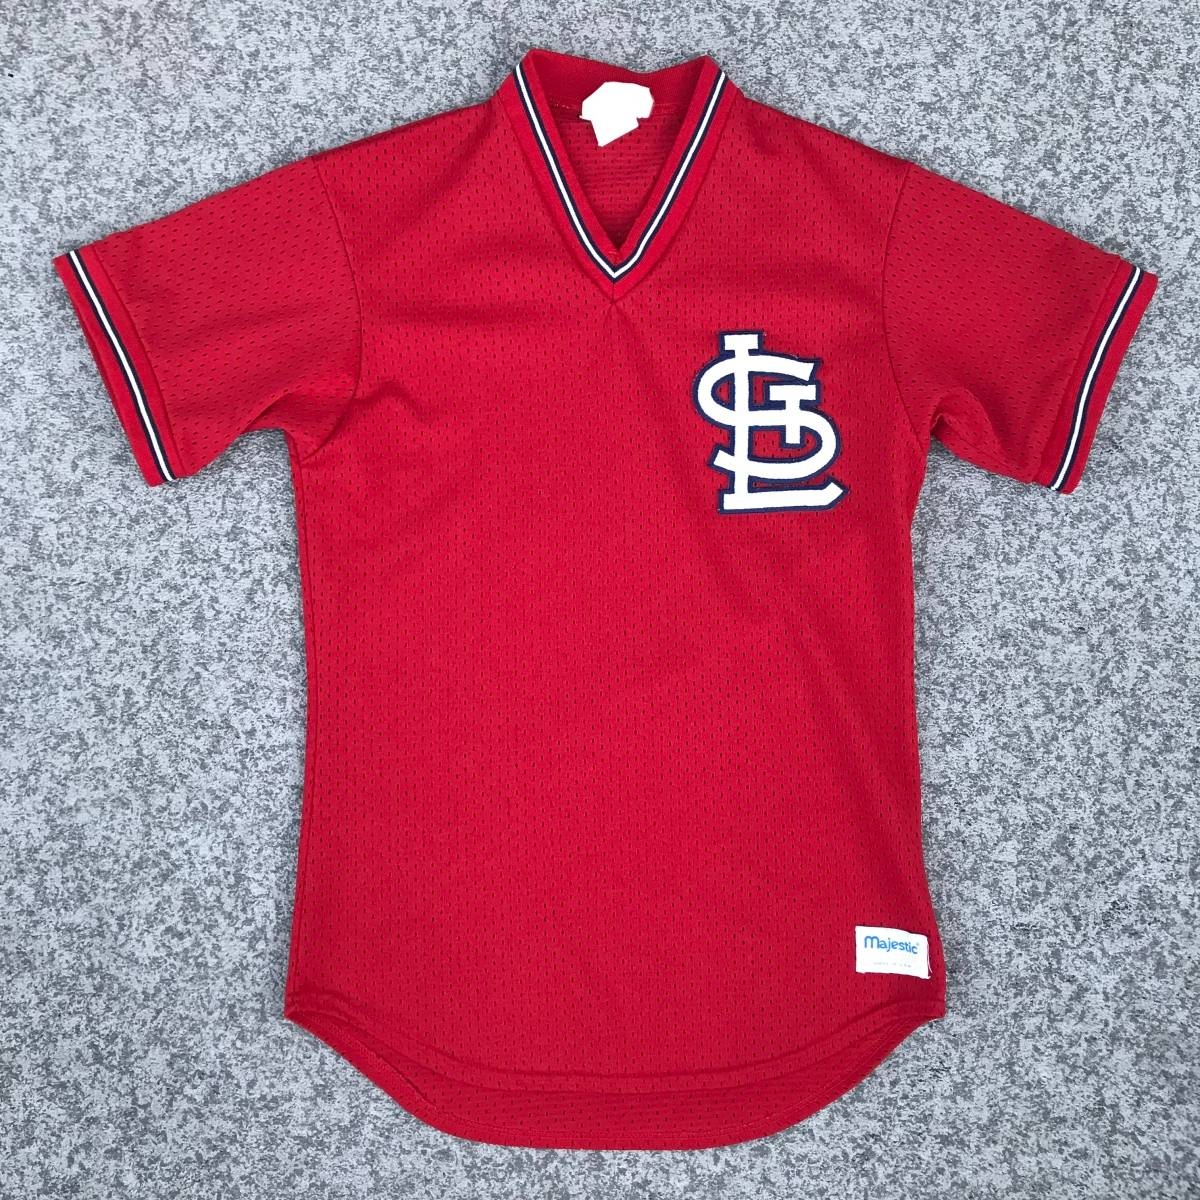 Majestic 80's St. Louis Cardinals Jersey